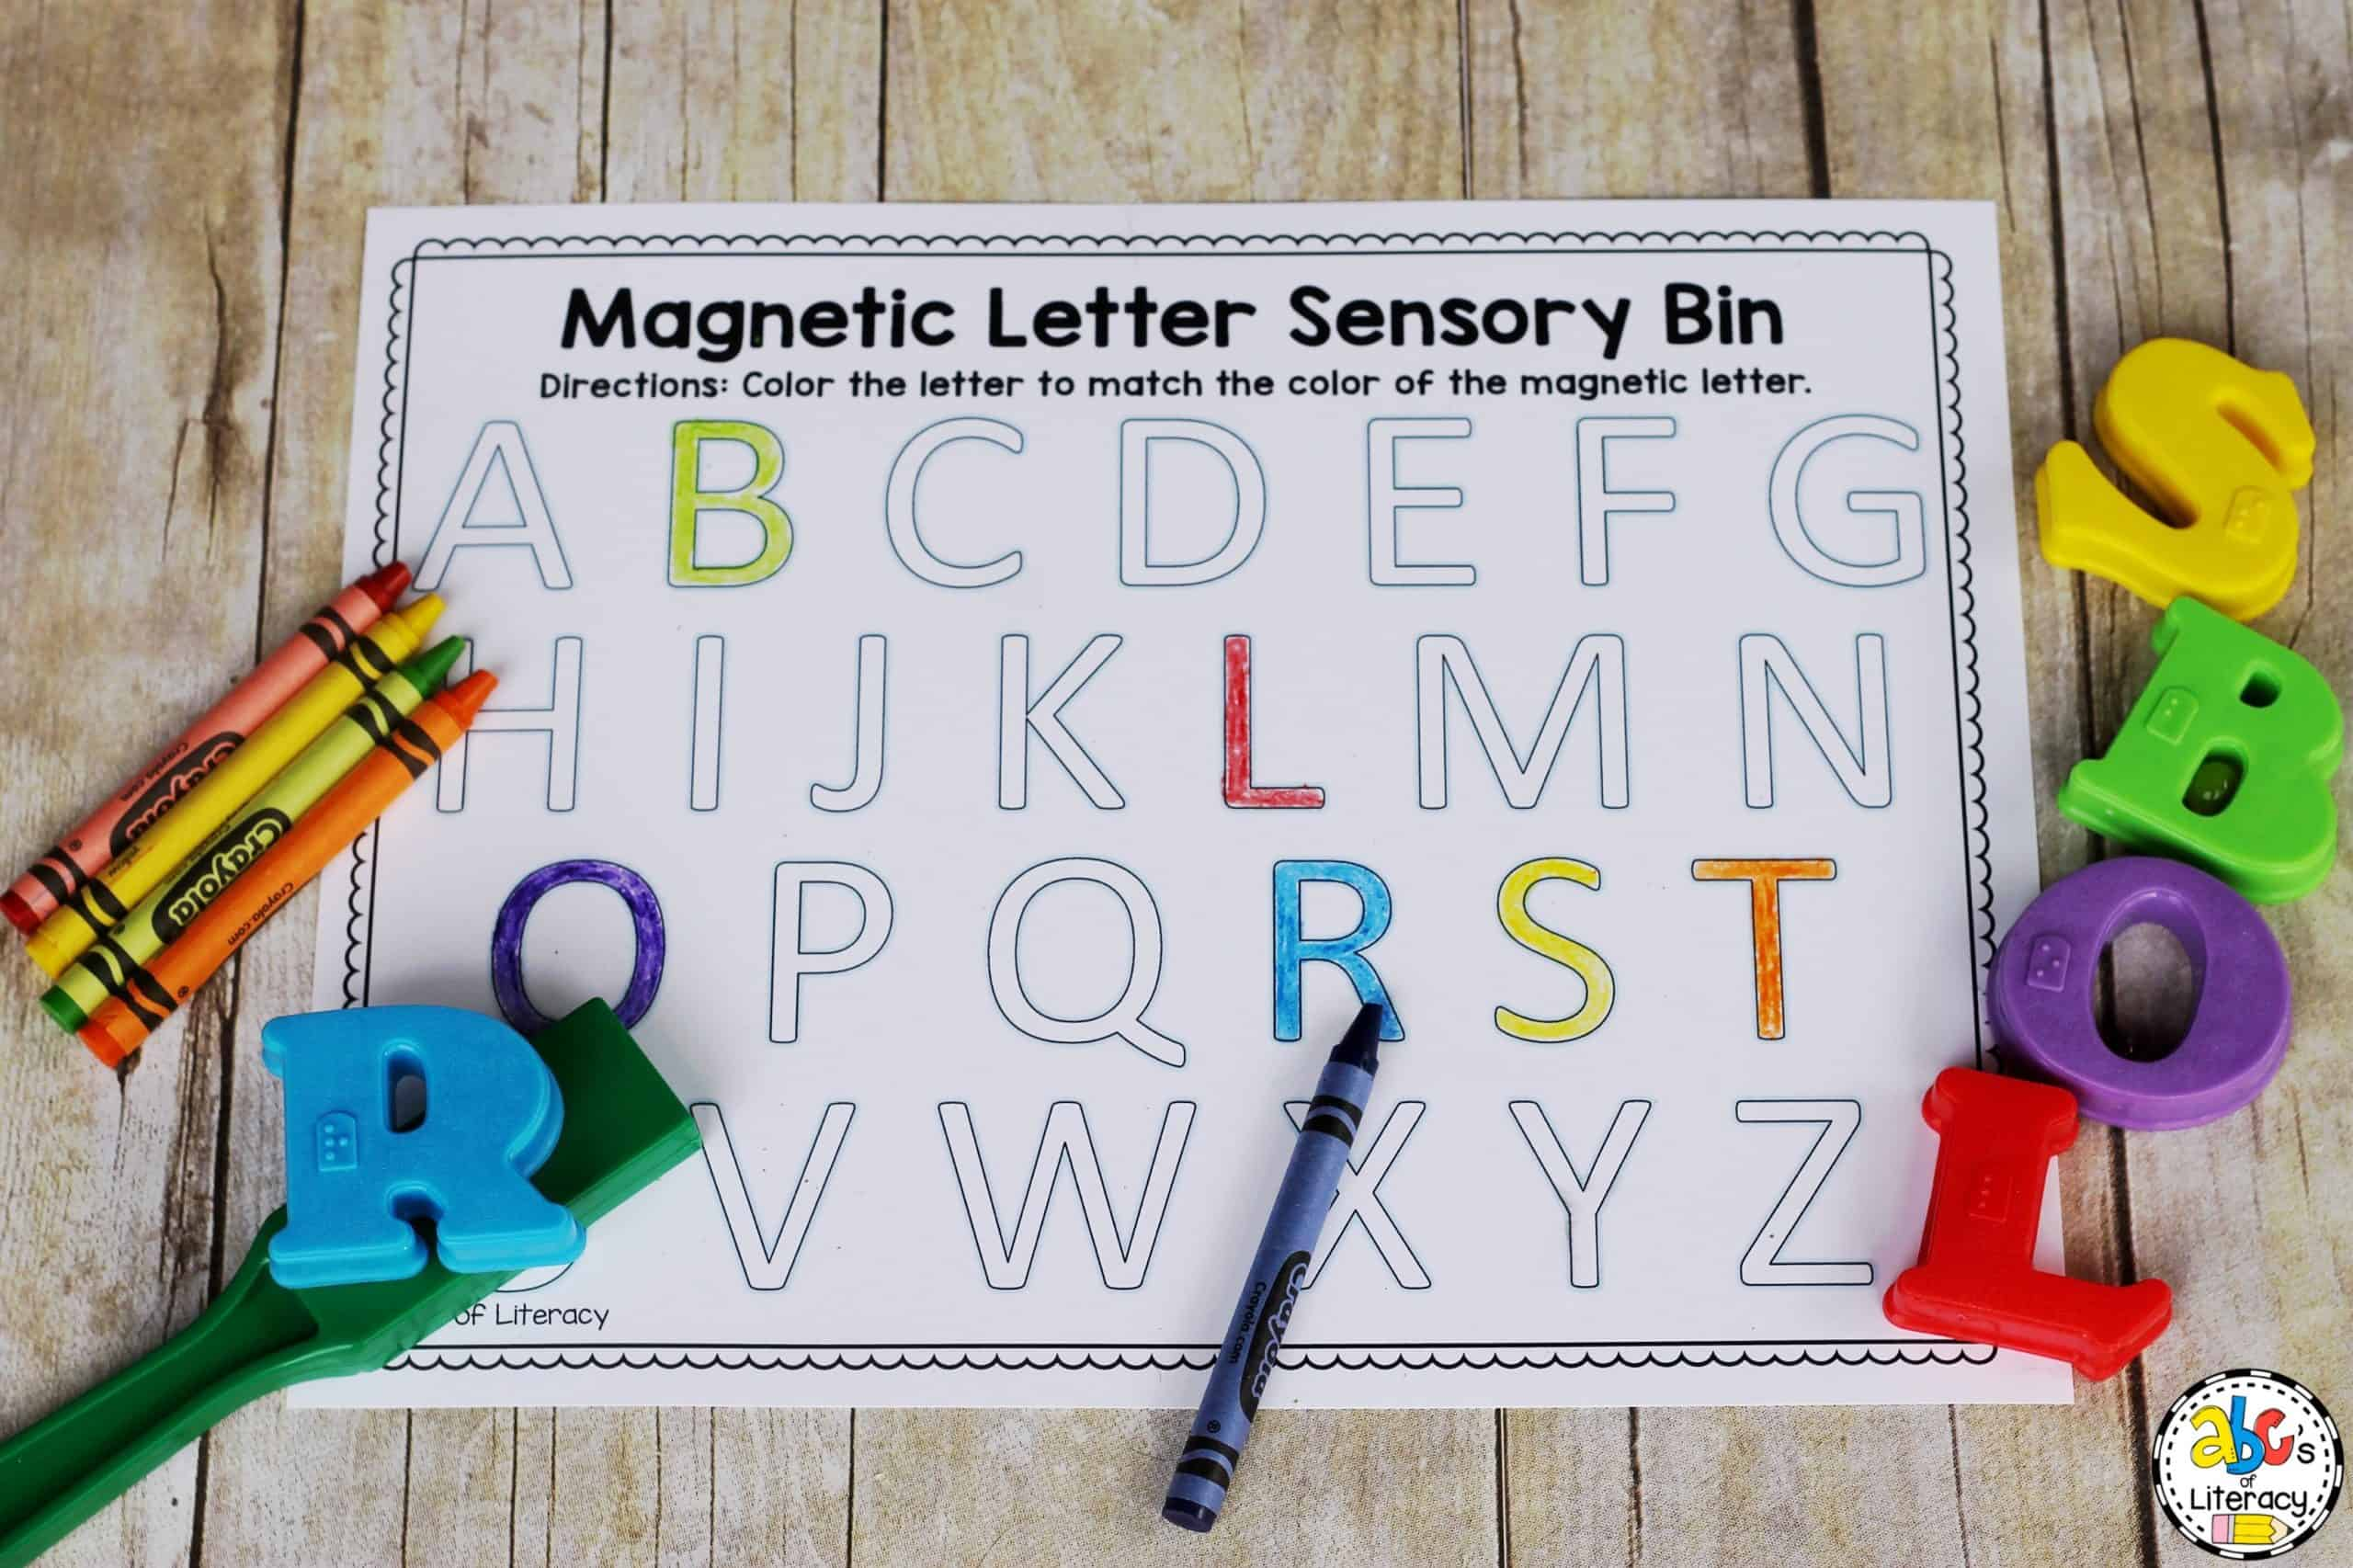 Magnetic Letter Sensory Bin Letter Recognition Activity